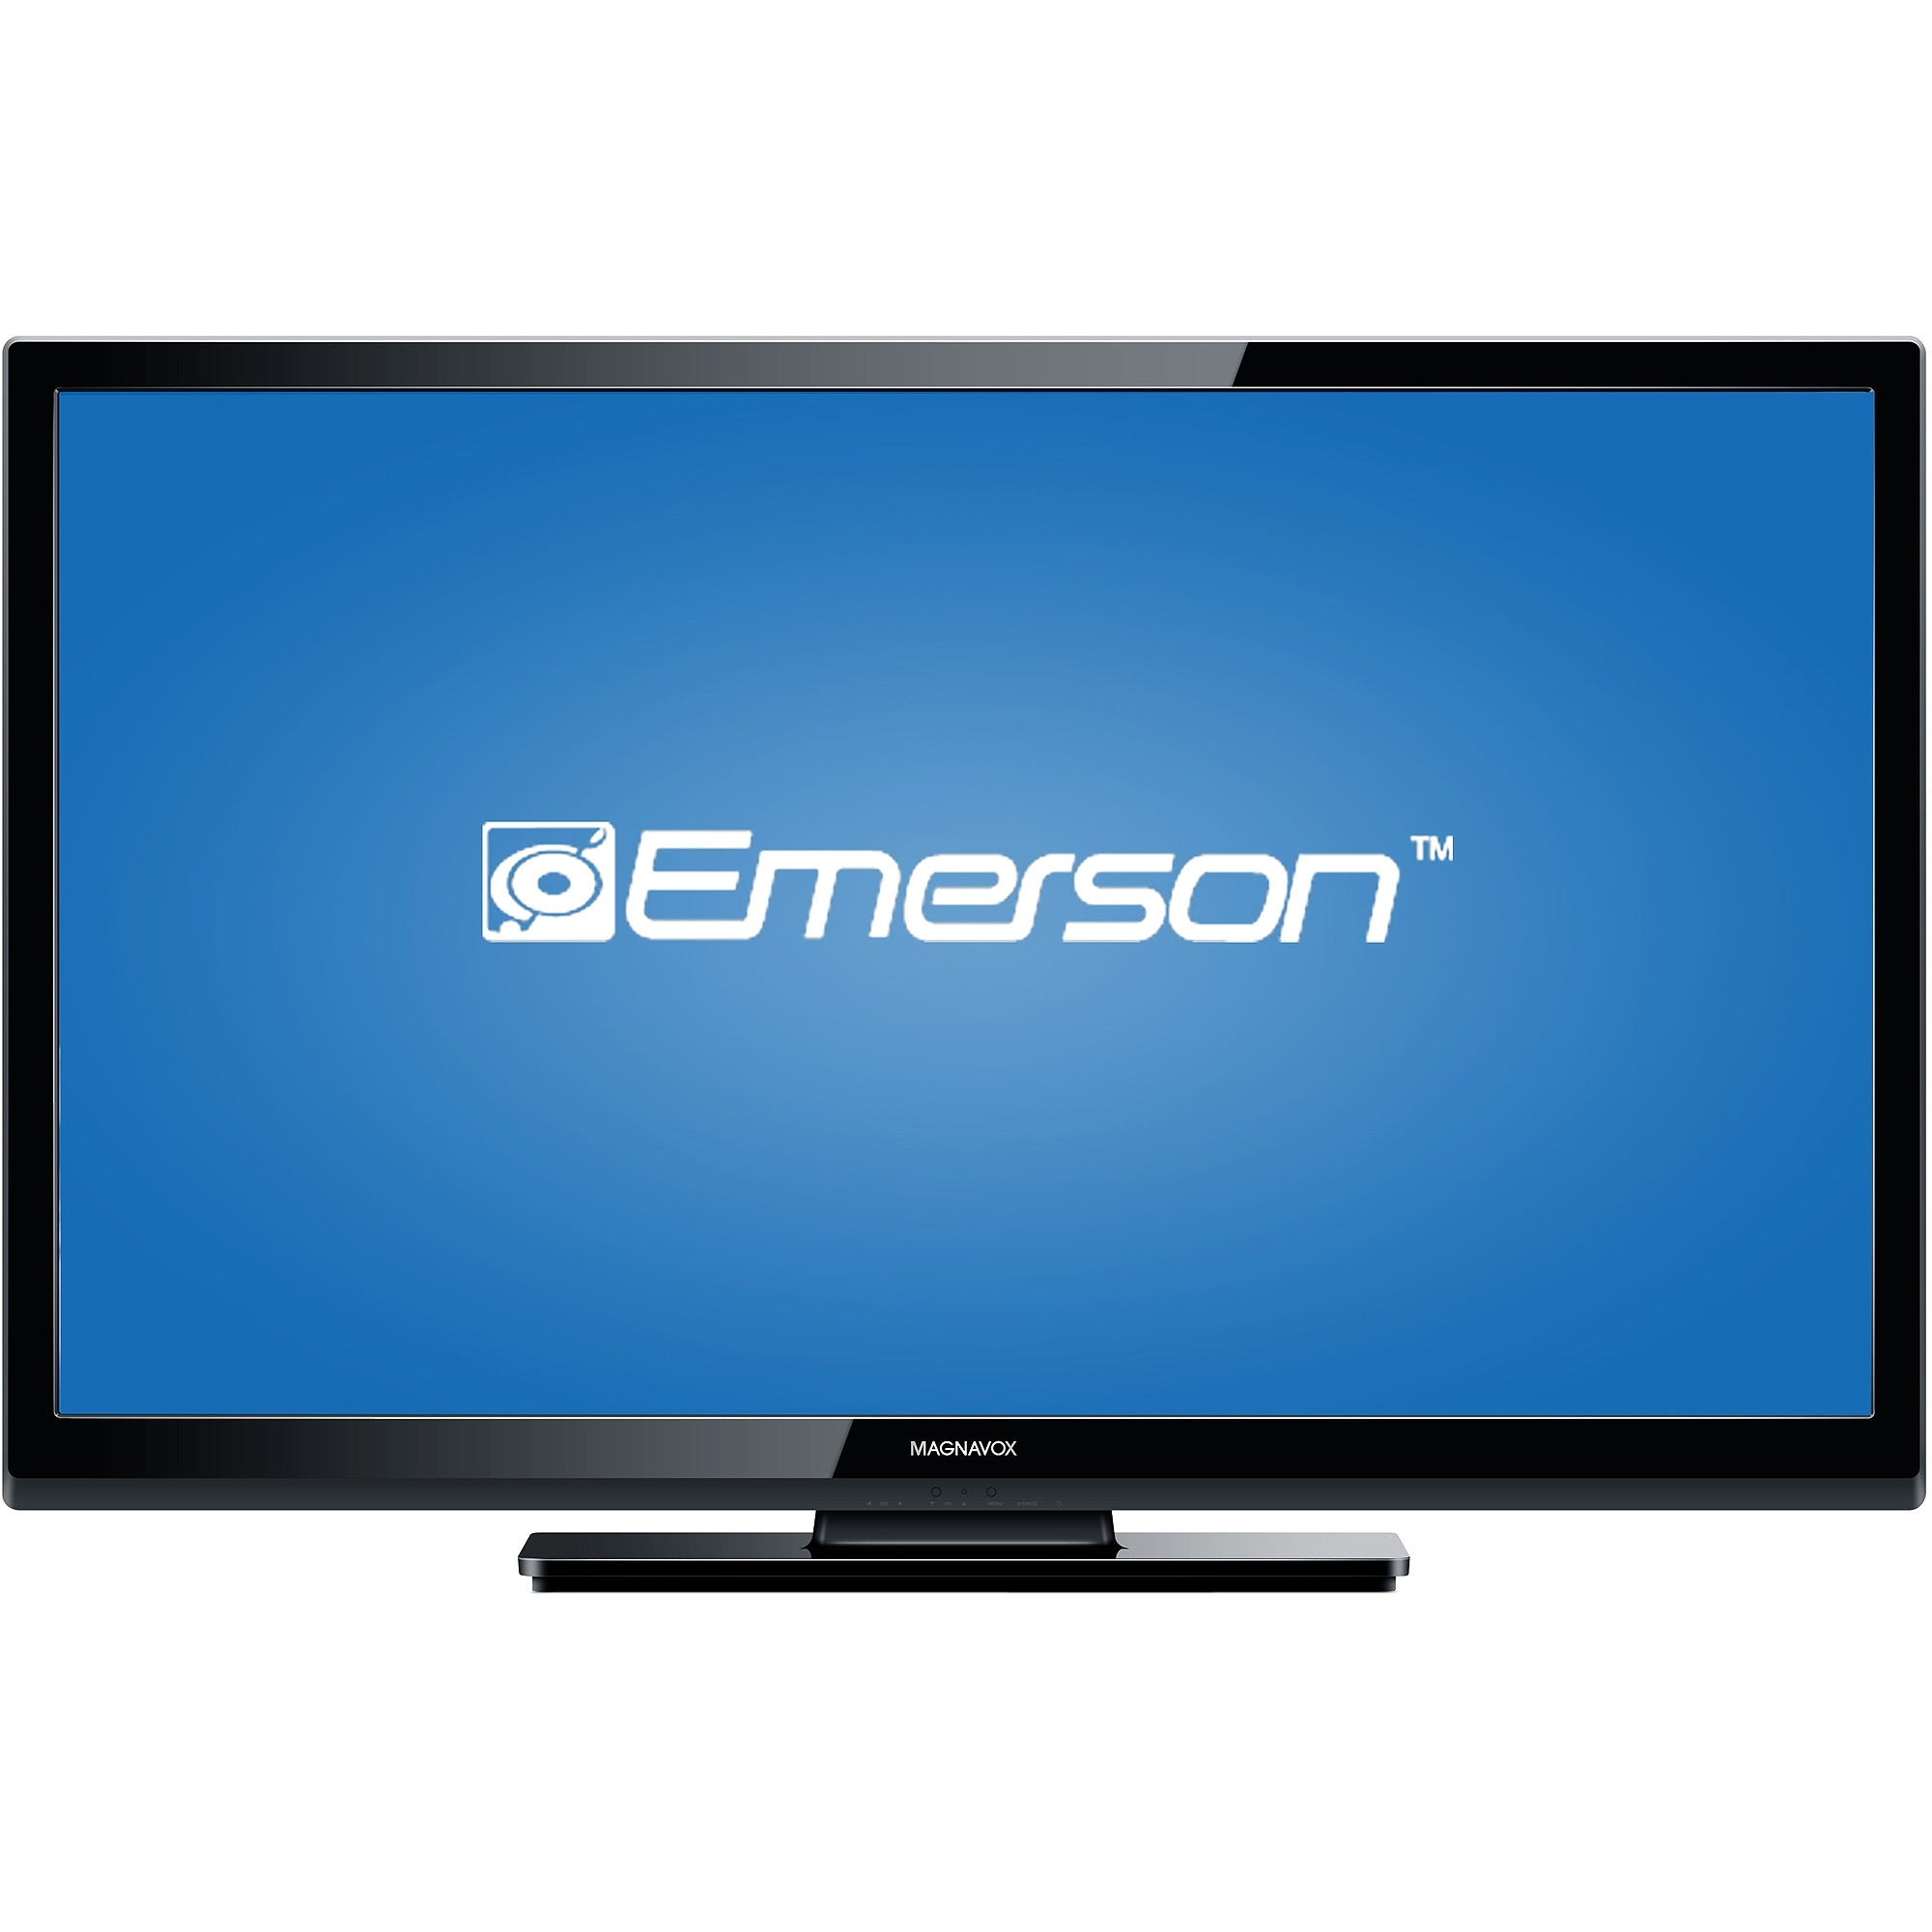 "Emerson�LF391EM4�1080p�39""�LED TV, Black� (Certified Refurbished) by Emerson"